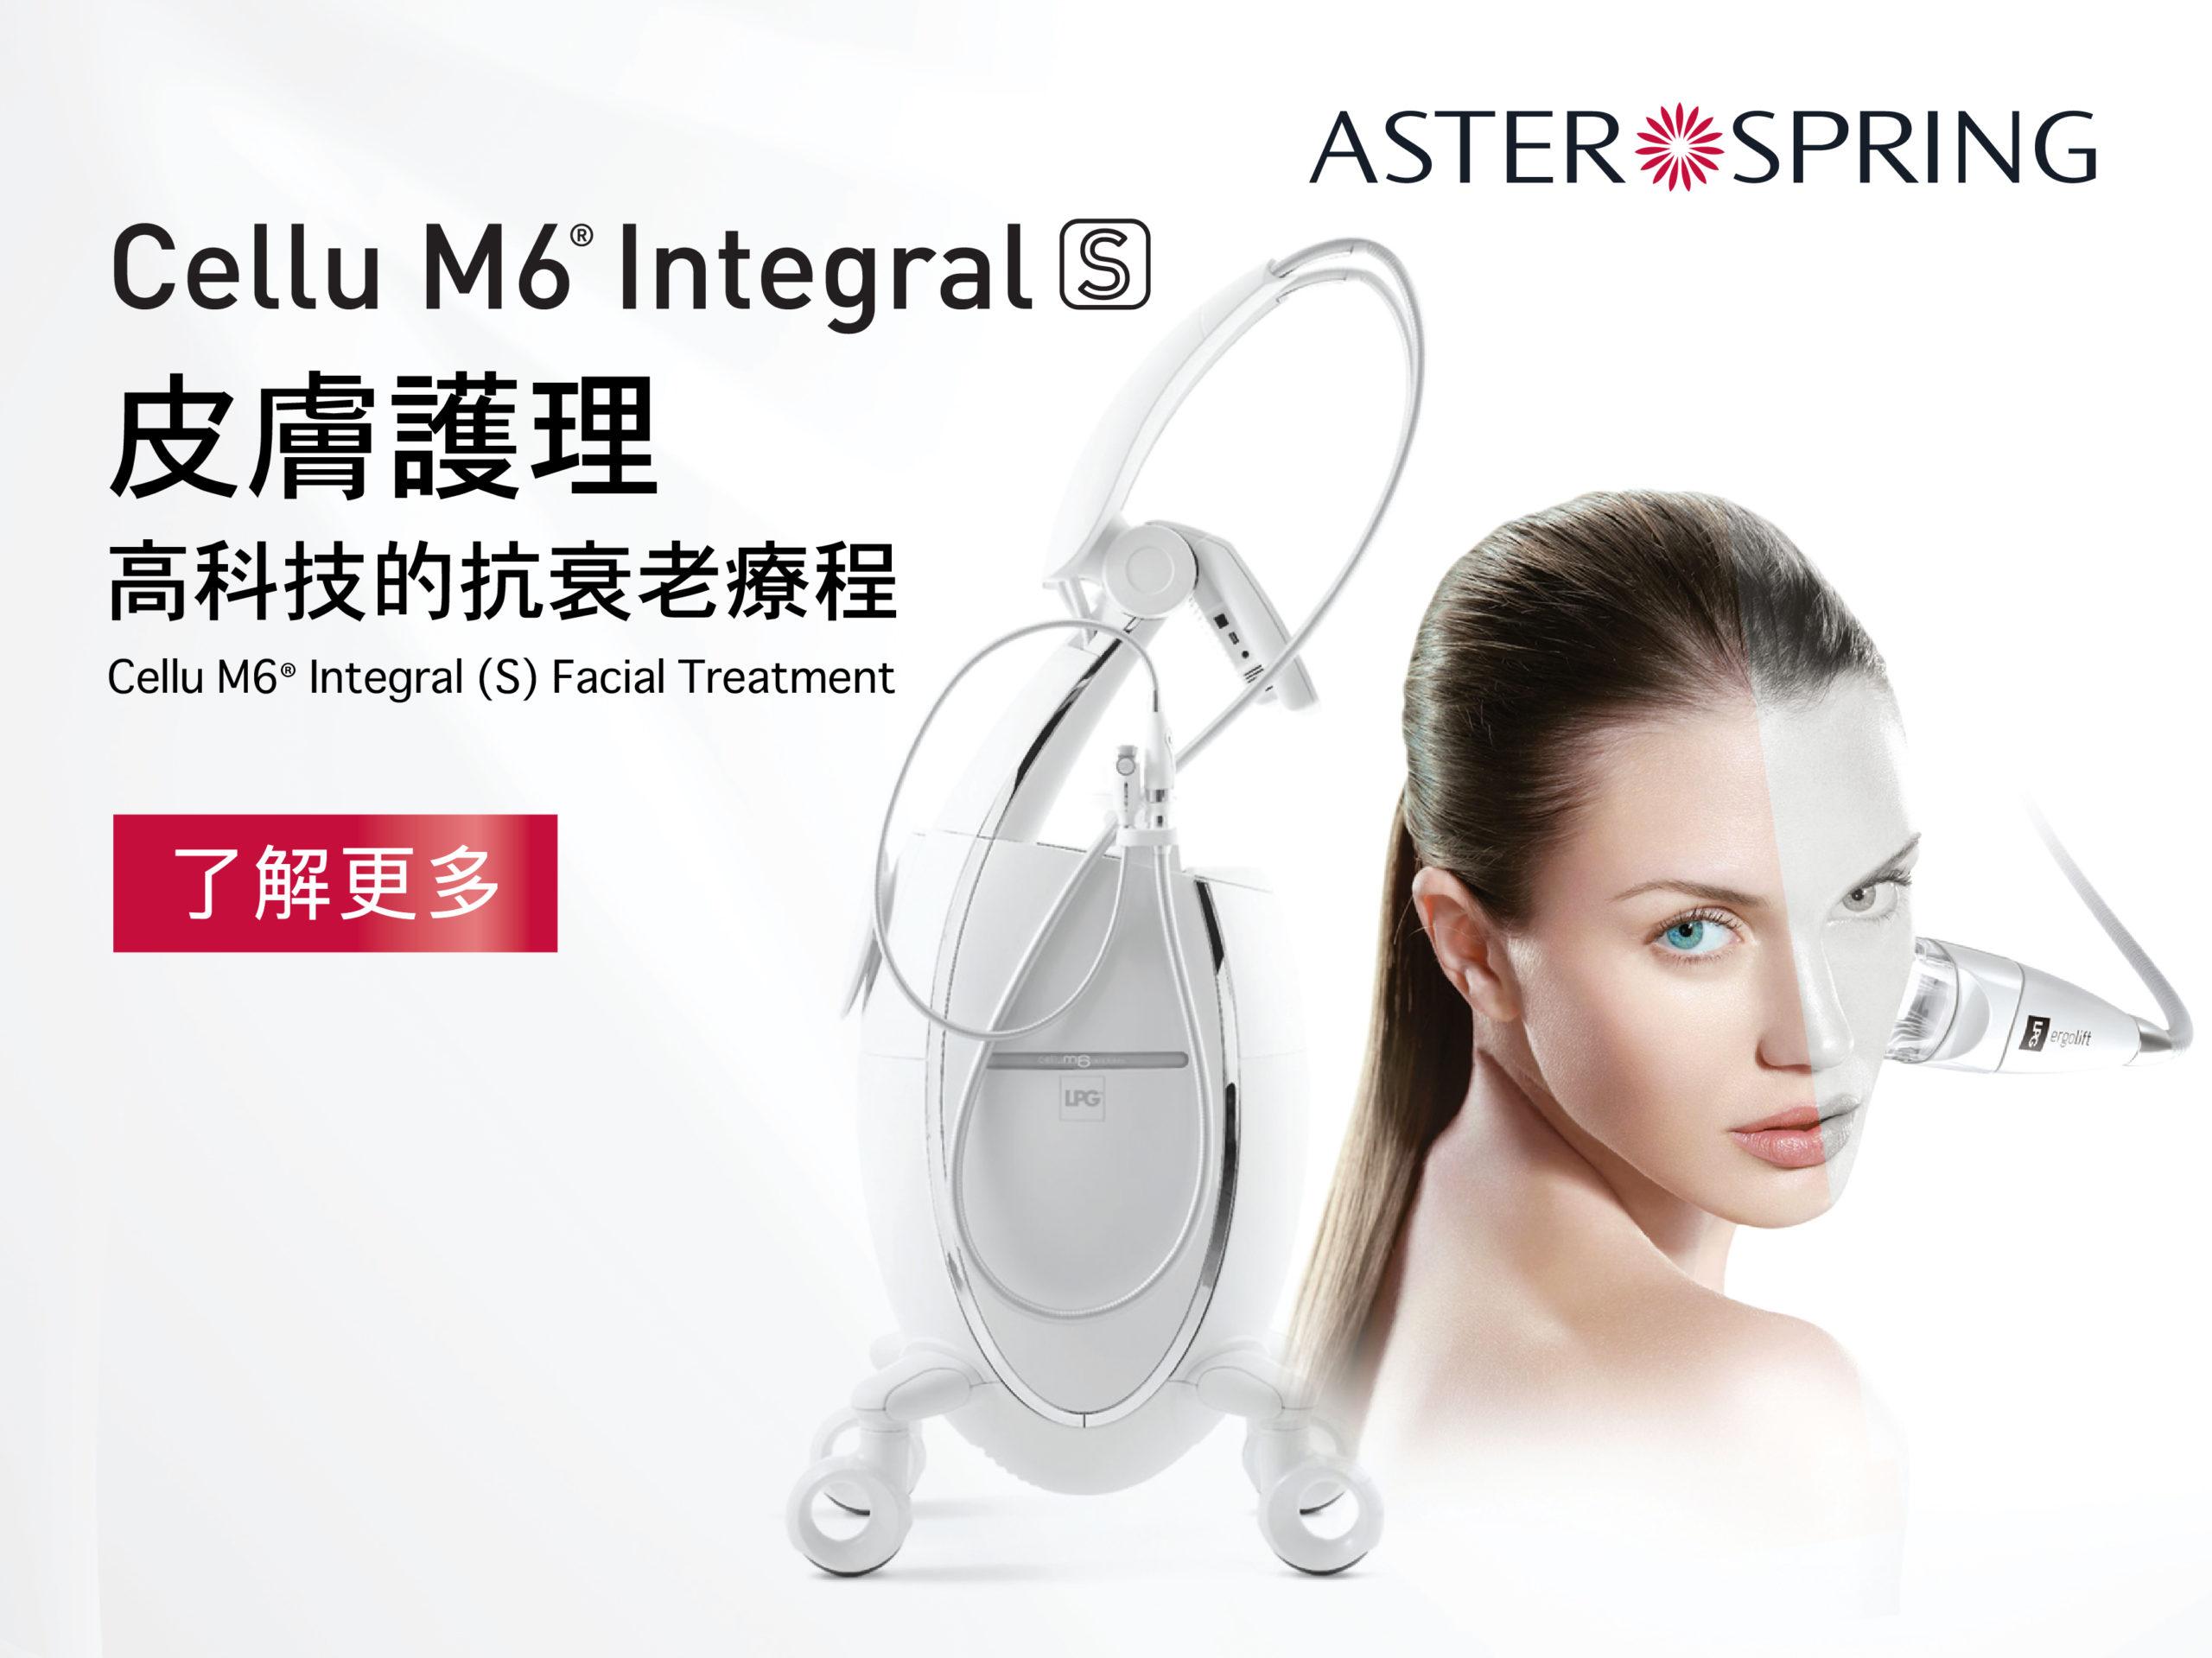 M6 皮膚再生面部護理透過LPG Cellu M6 Integral機,嶄新獨有科技MPF微型機動活瓣機頭,以真空負壓吸力令組織被受刺激3倍,能緊緻肌膚、激活纖維母細胞自然增生,締造亮麗無暇美肌